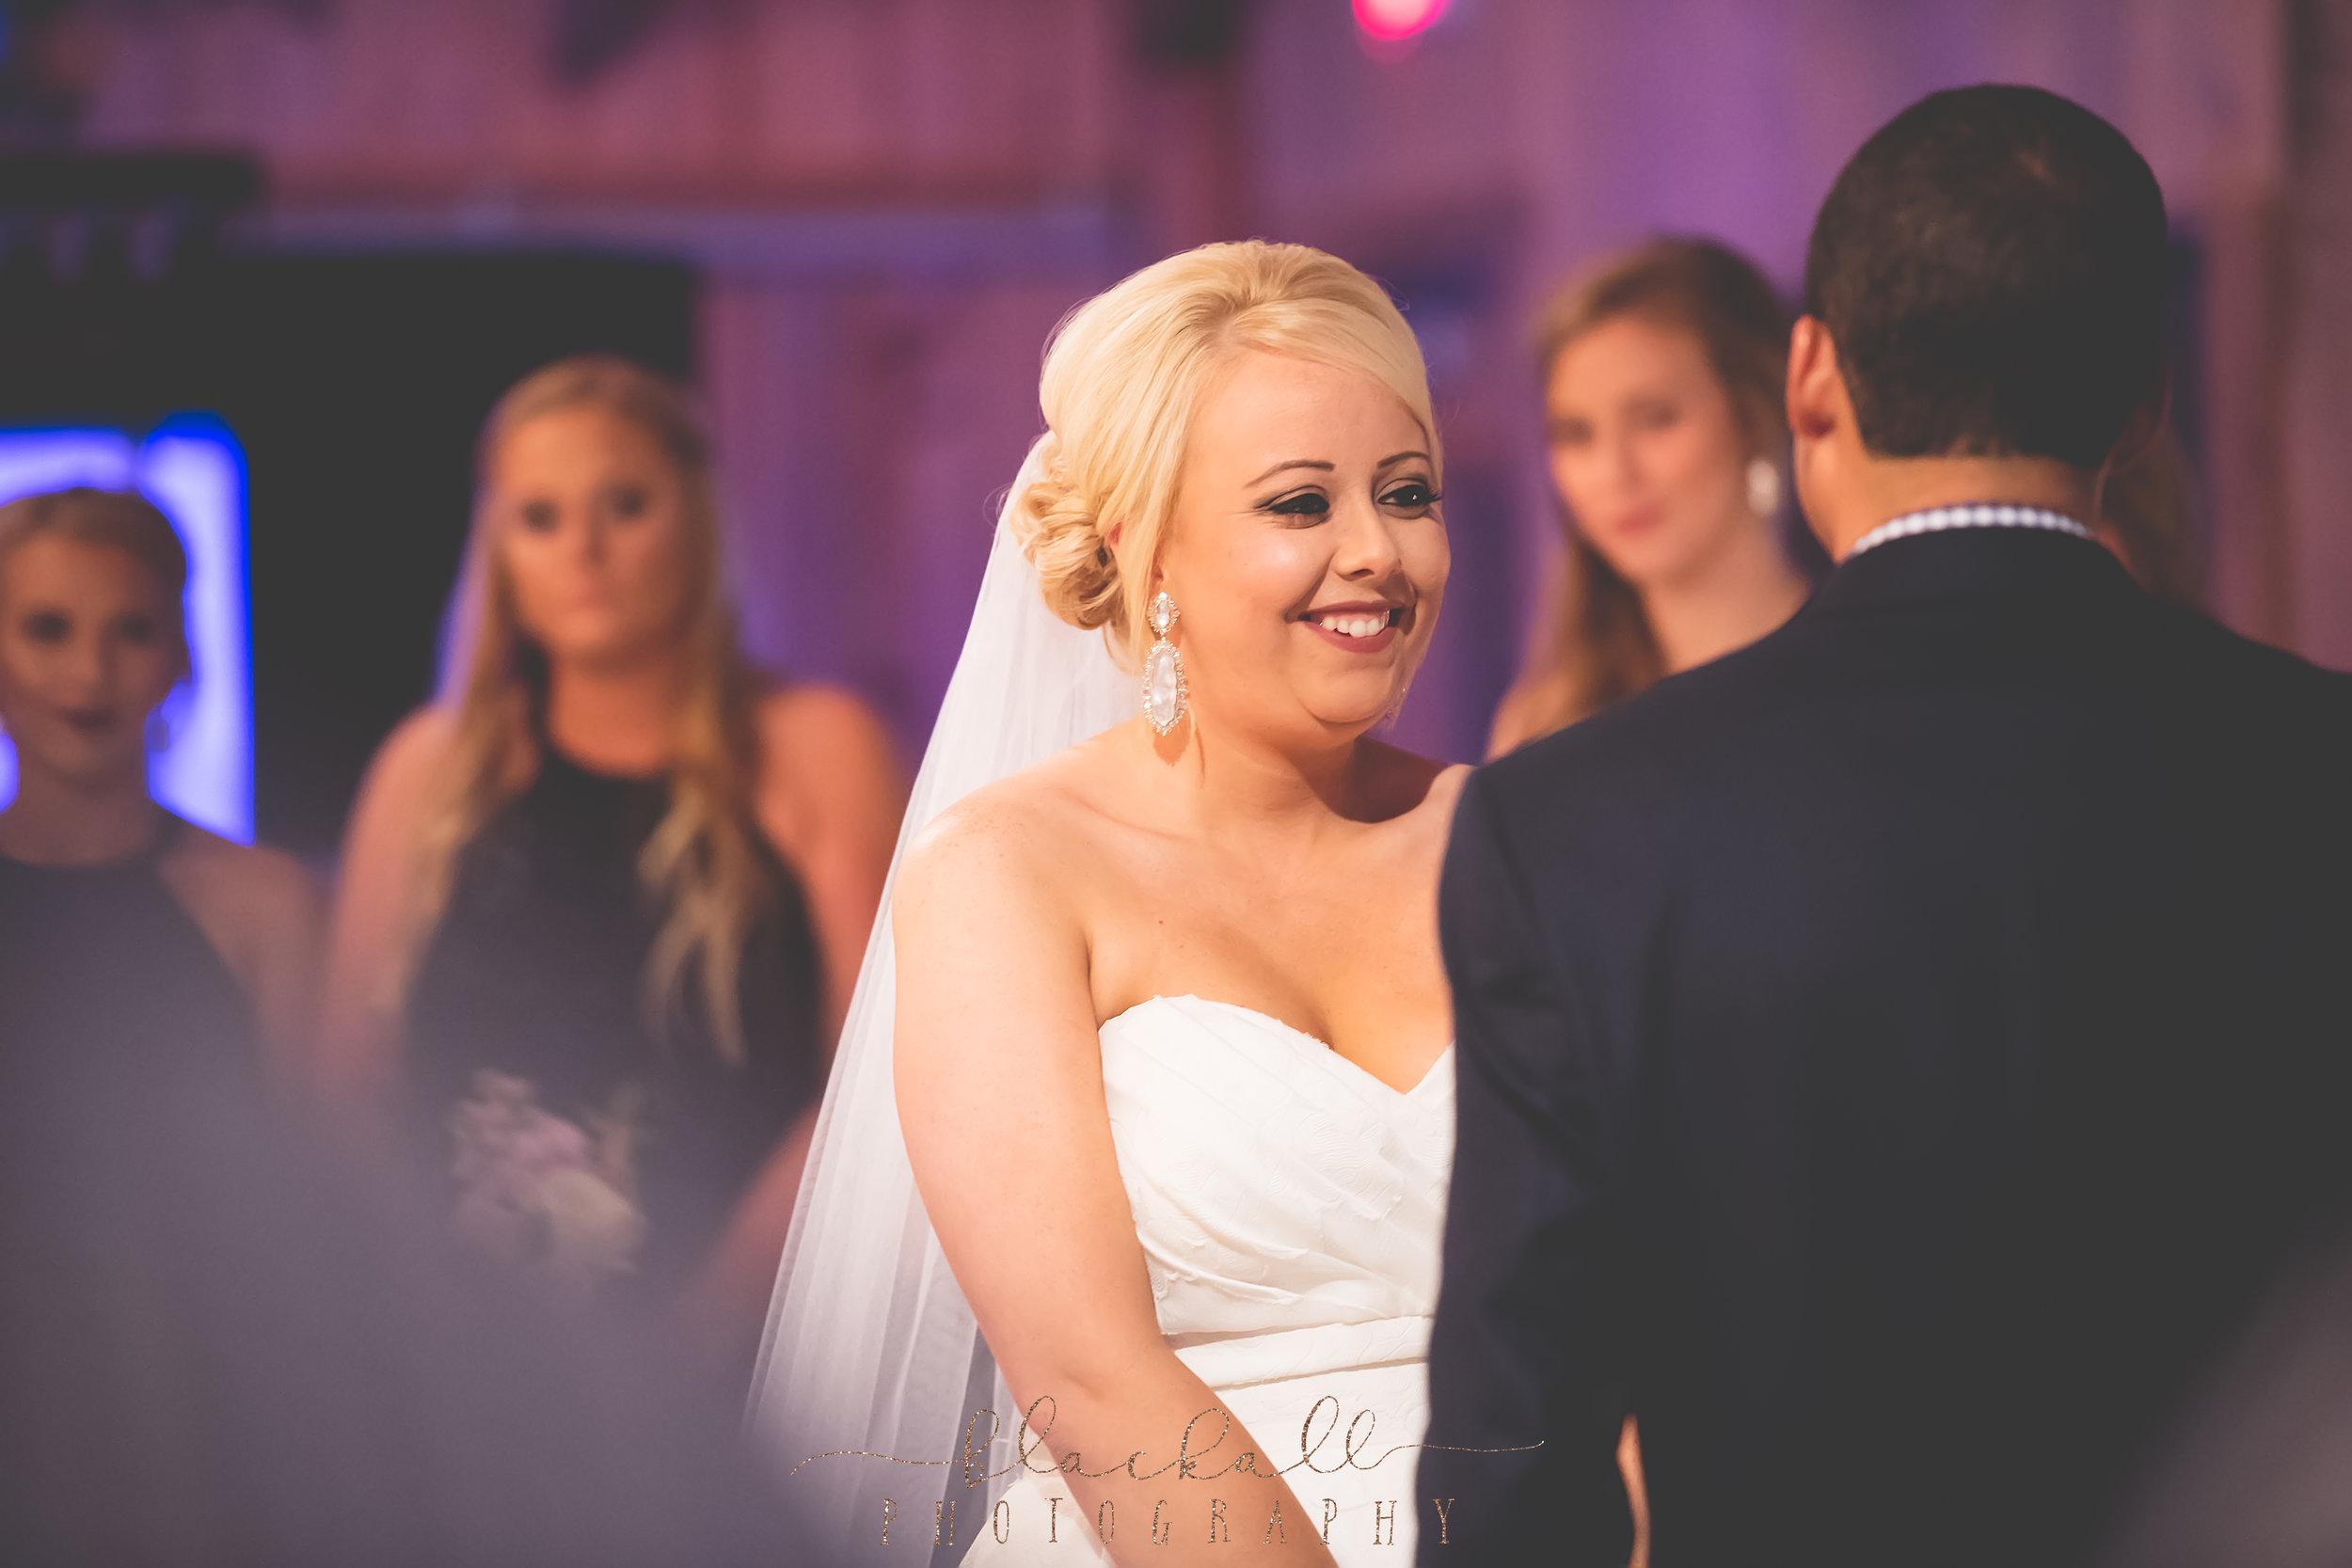 M&M WEDDING_Blackall Photography-39.JPG